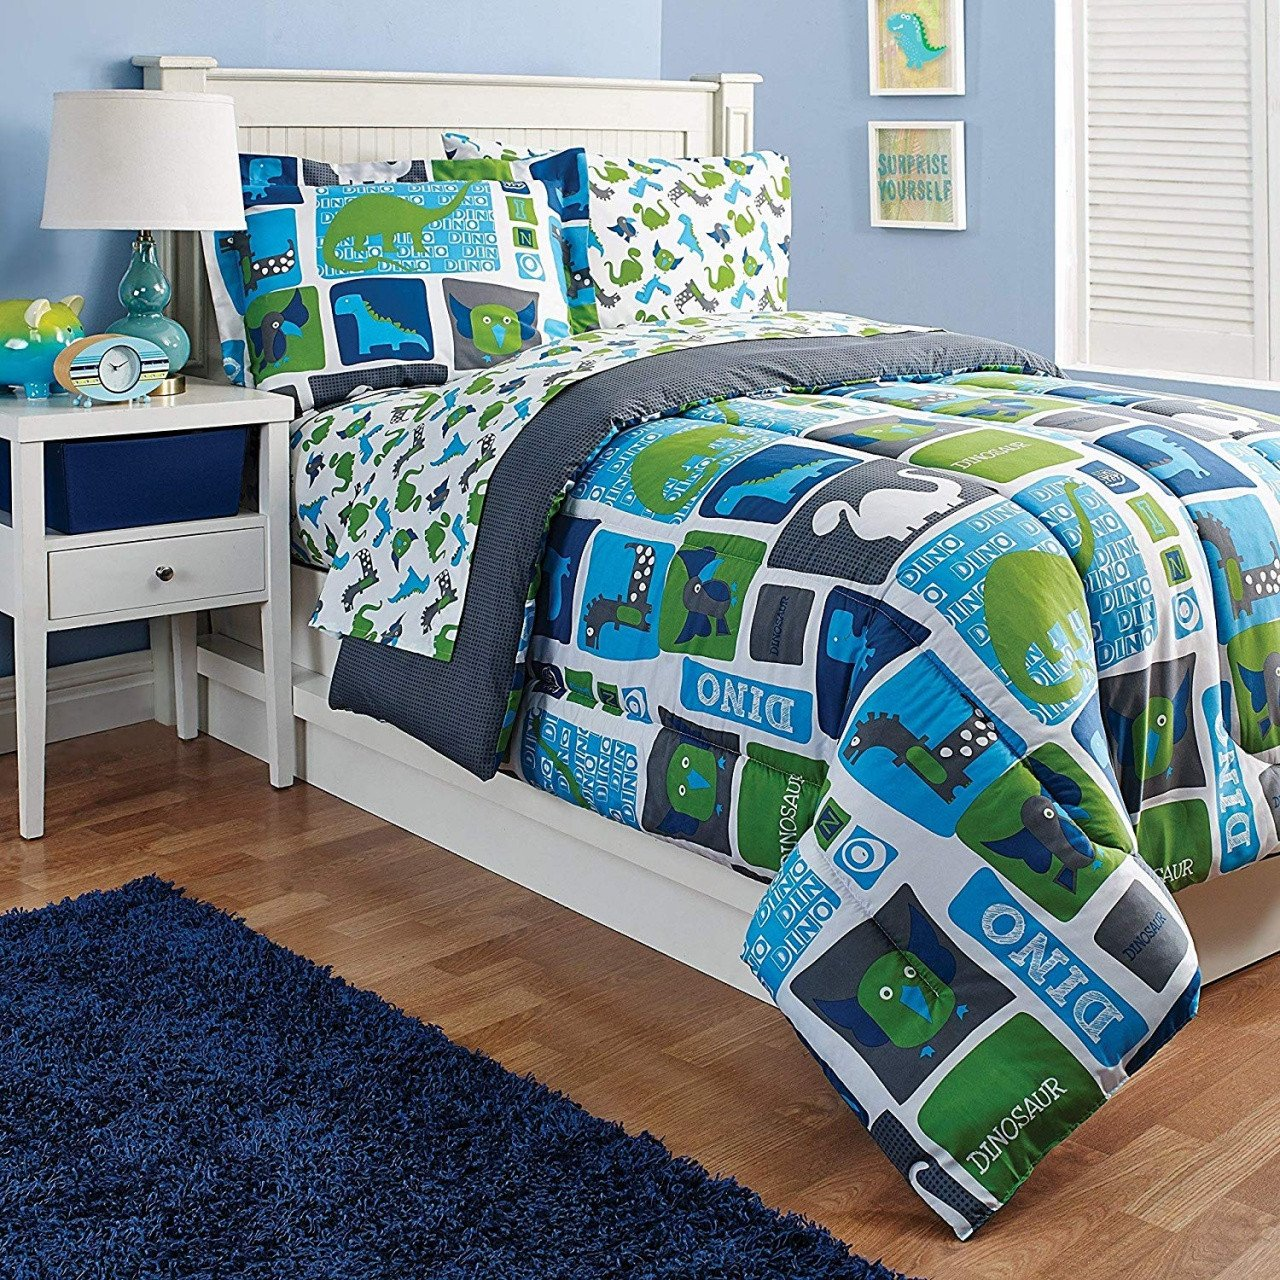 Twin Bedroom Set Ikea Awesome Kids Bedroom Sets Under 500